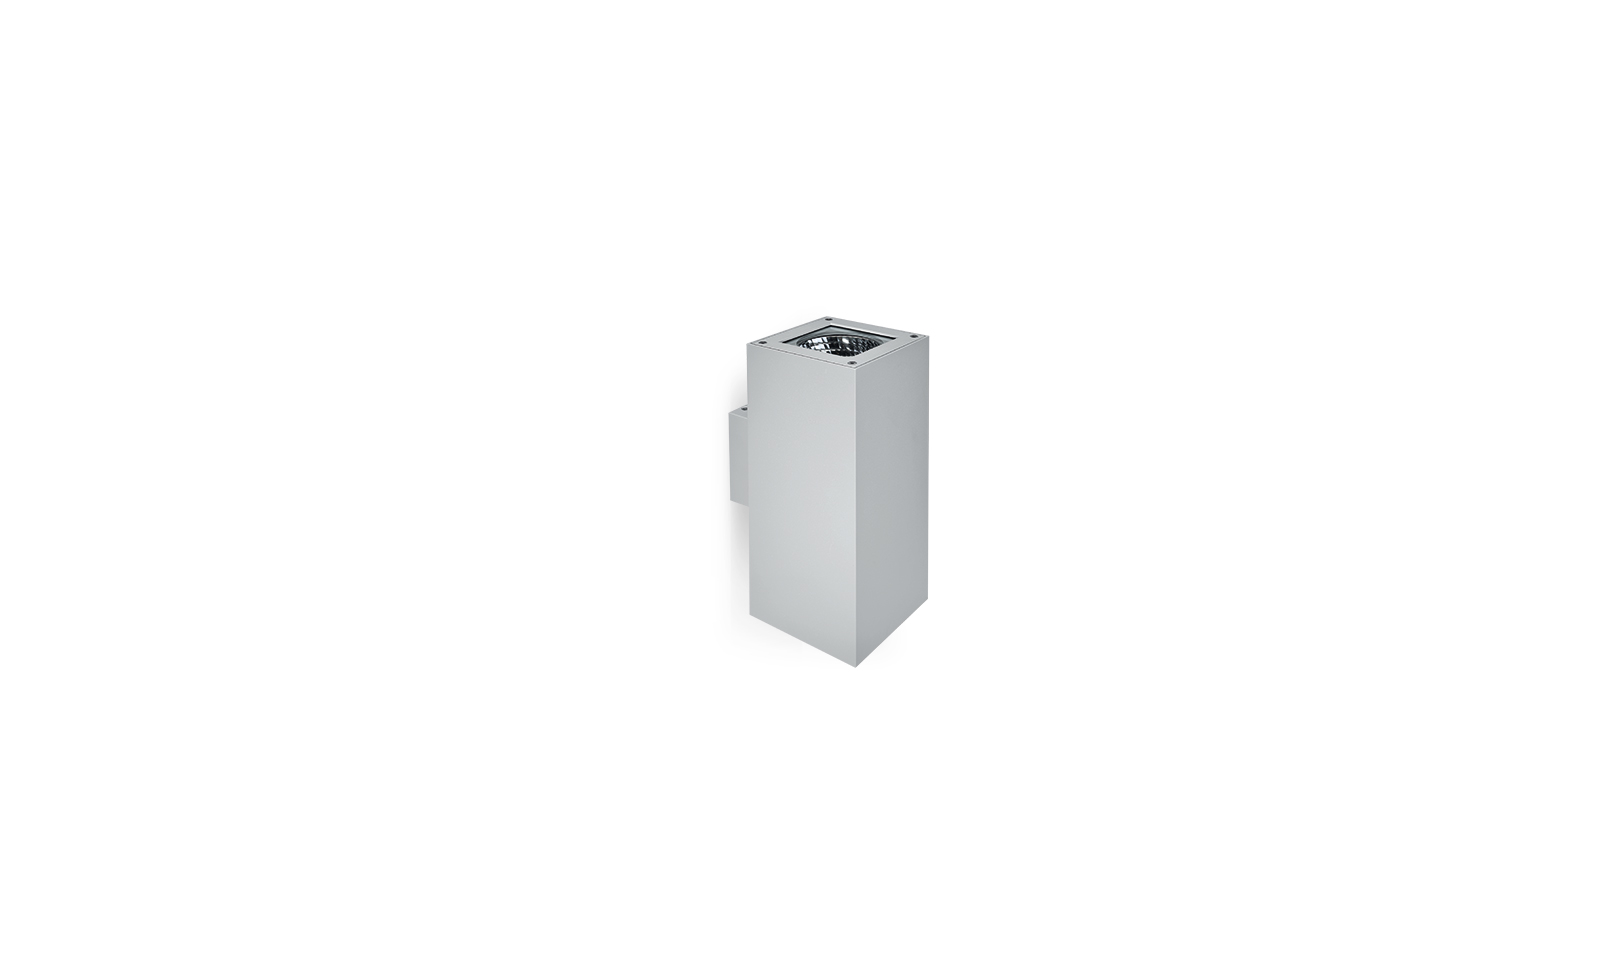 401011 TECH MAXI 02 SQUARE LED 2x39W 2